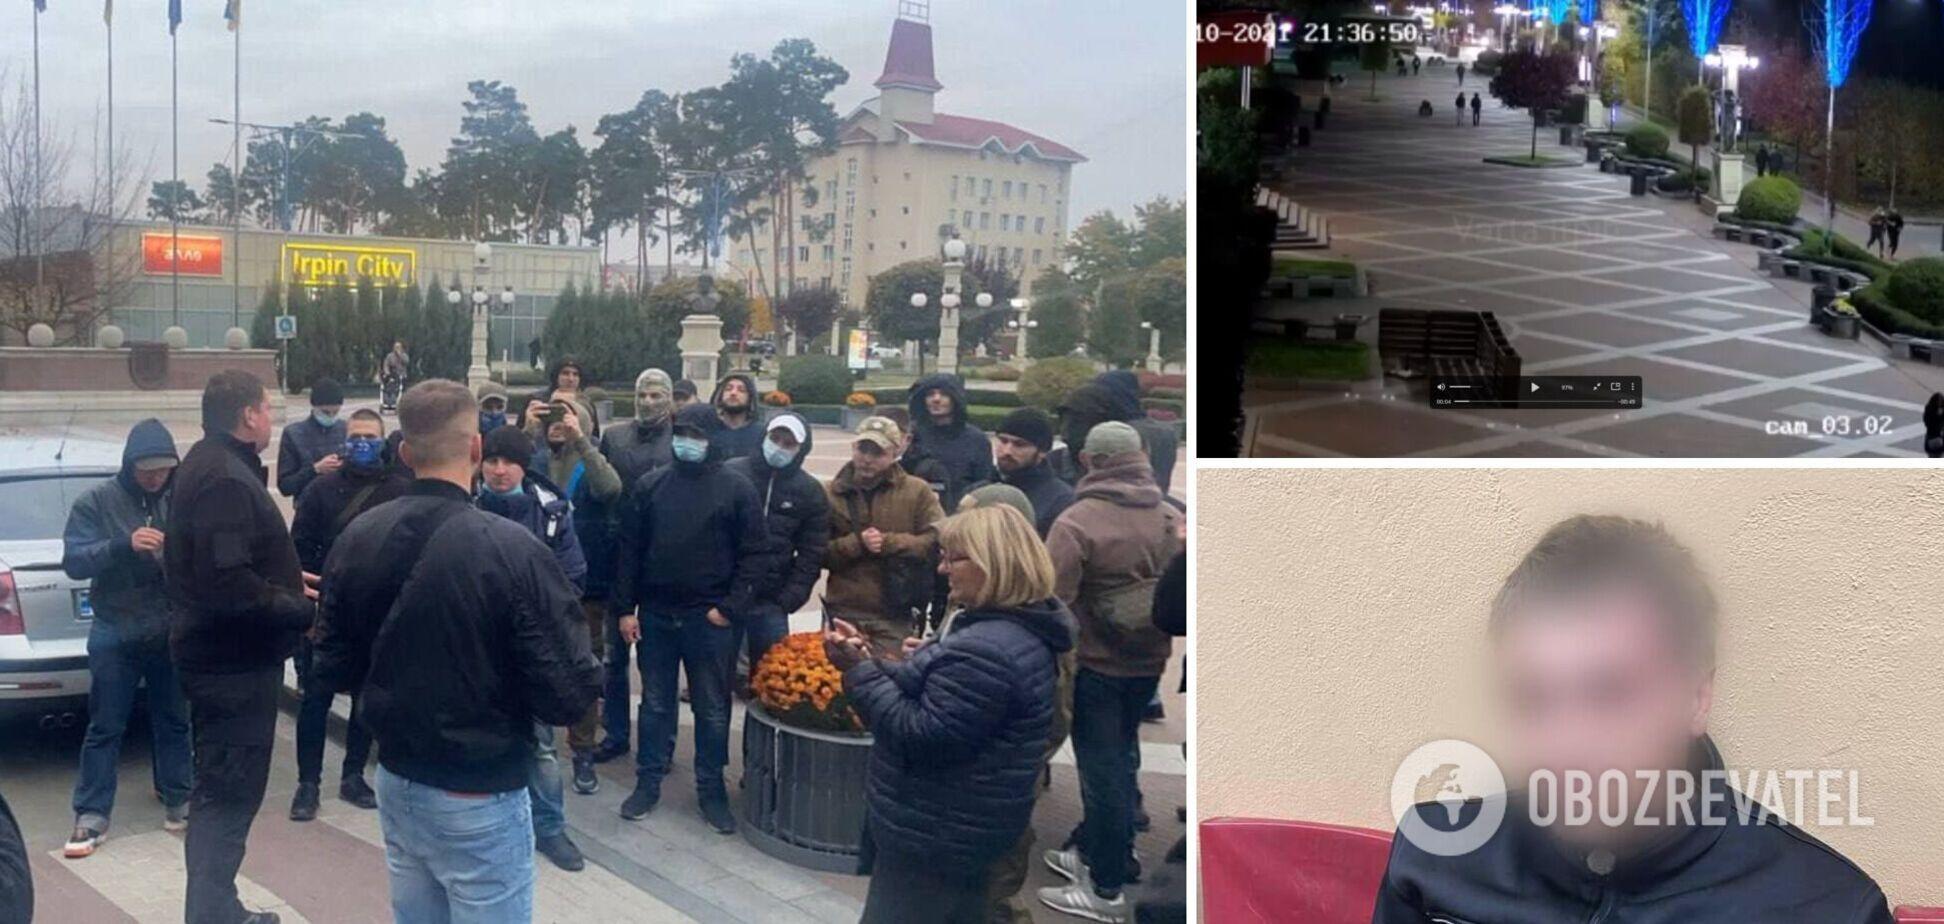 Под Киевом избили ветерана АТО, а нападавших отпустили: люди вышли на митинг. Фото и видео